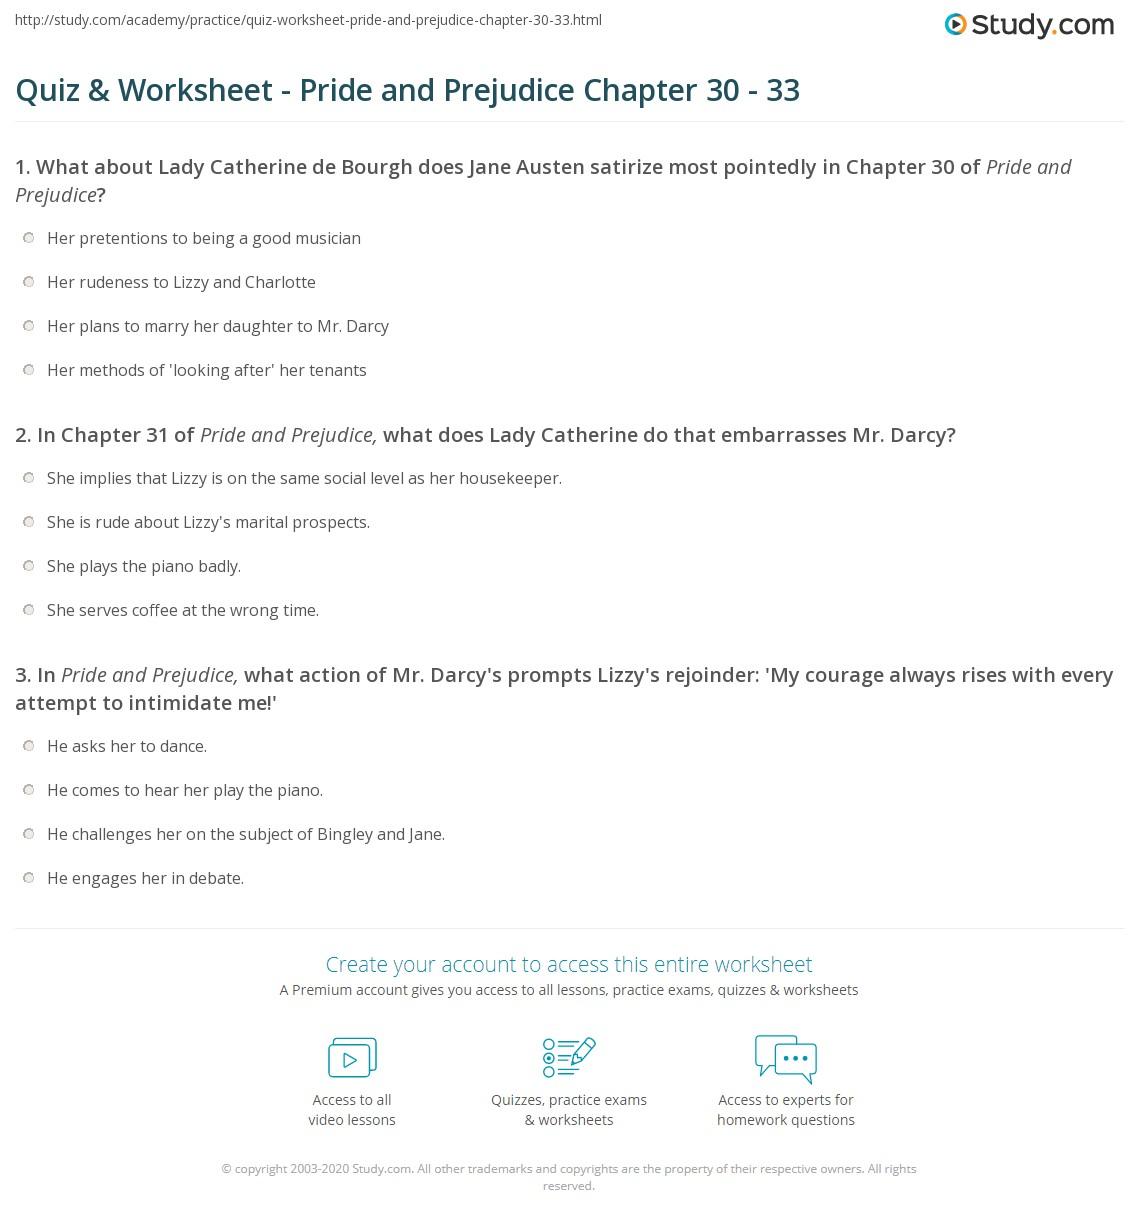 quiz worksheet pride and prejudice chapter 30 33 study com rh study com pride and prejudice study guide answers volume 1 pride and prejudice study guide answers volume 2